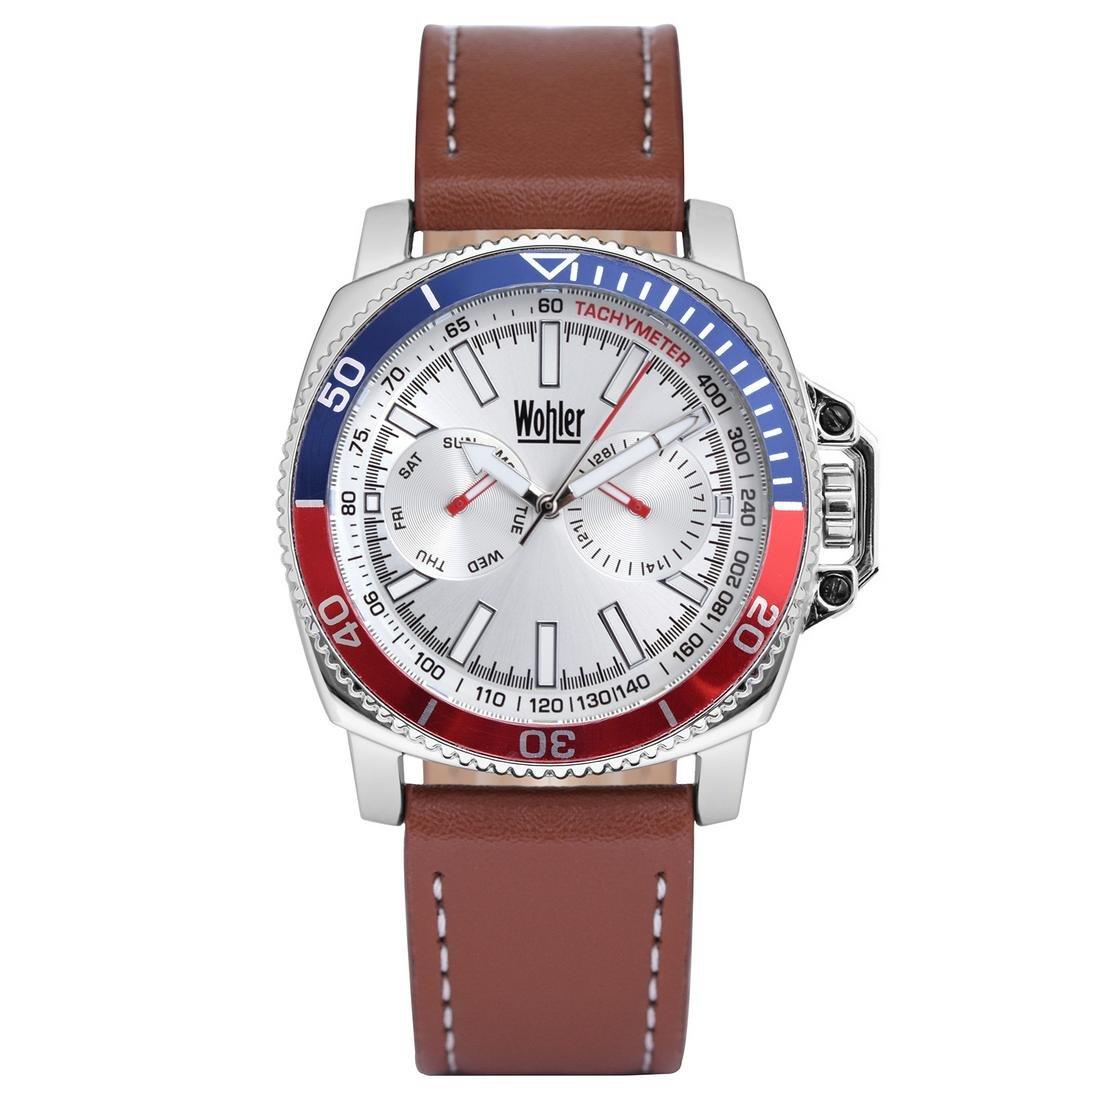 Wohler Tribecca Multi-Function Men's Watch